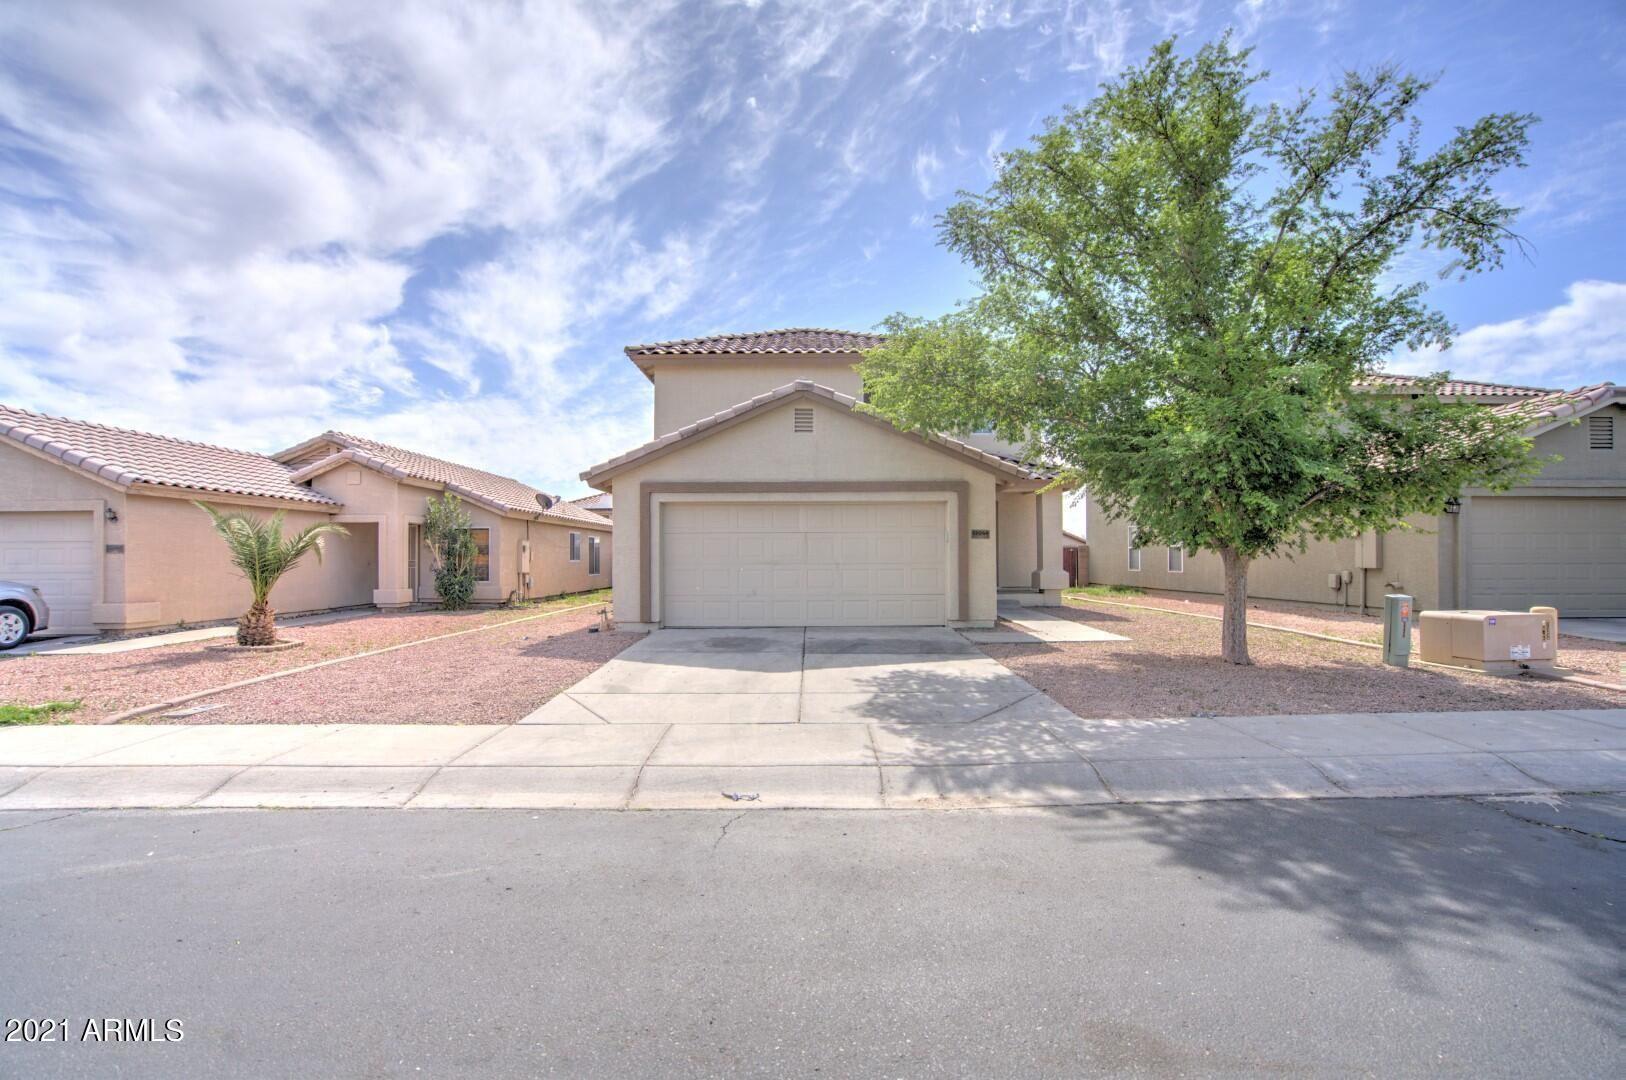 Photo of 12049 W ASTER Drive, El Mirage, AZ 85335 (MLS # 6300763)